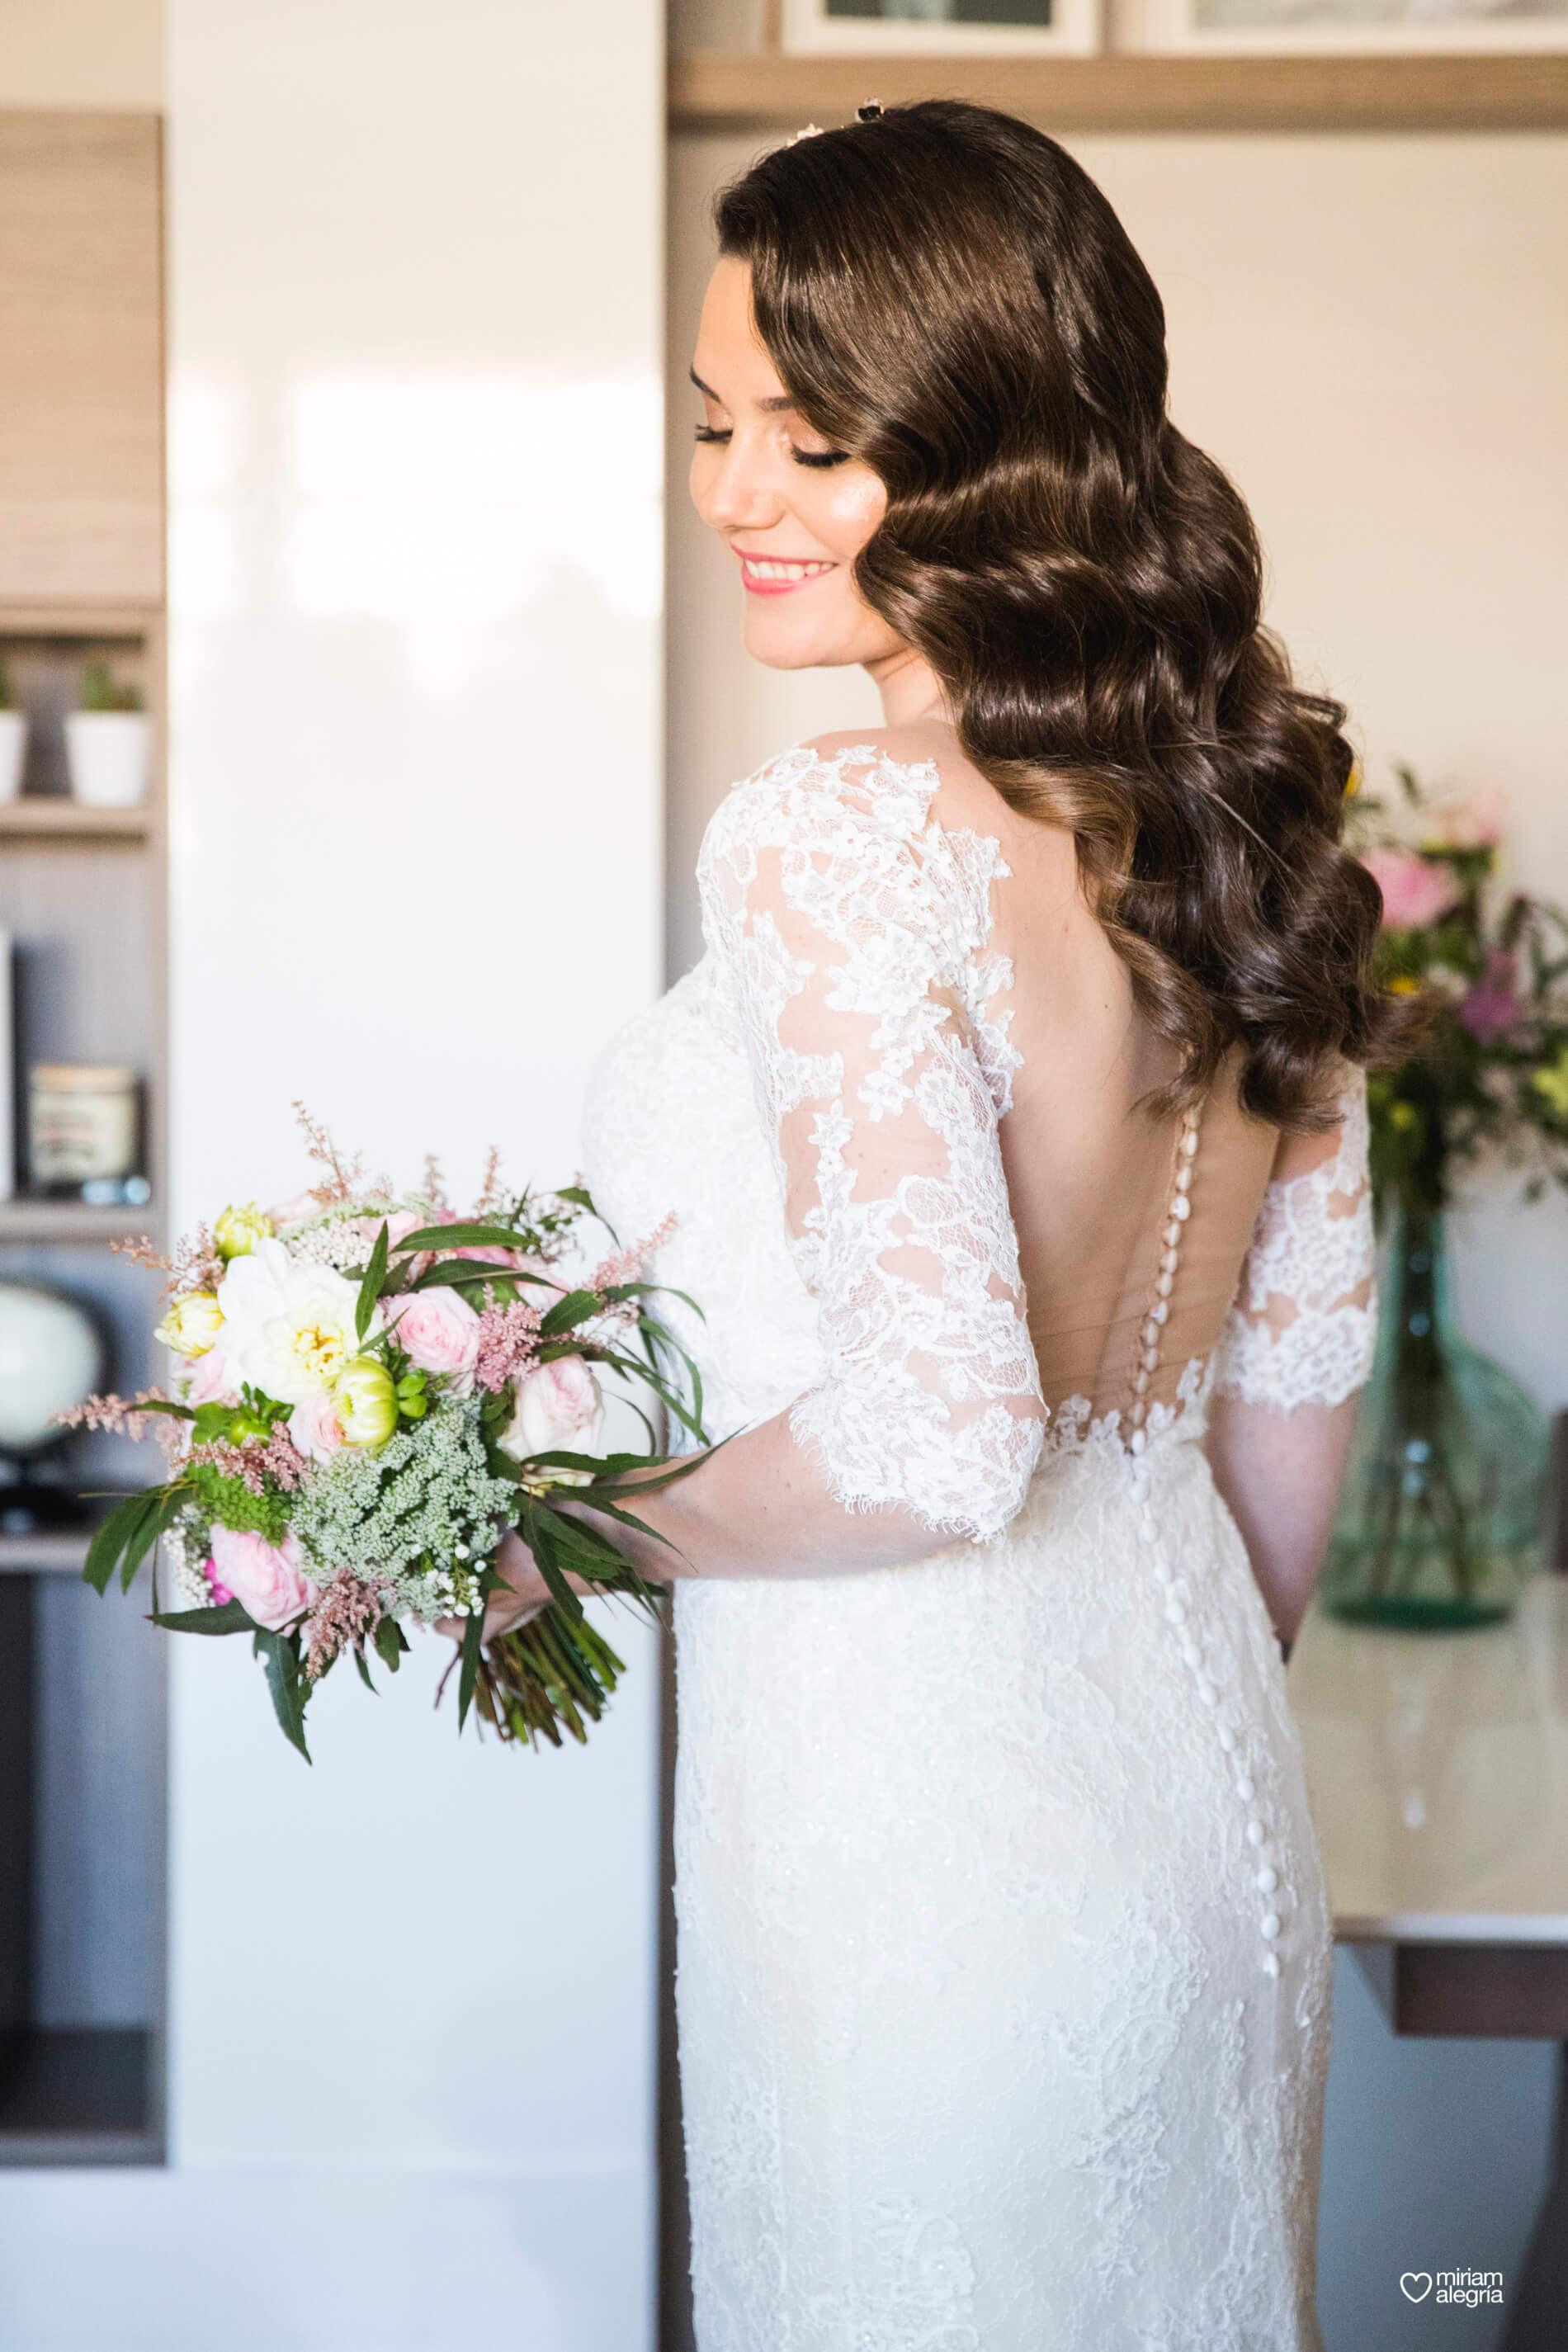 boda-en-finca-jurosa-miriam-alegria-35